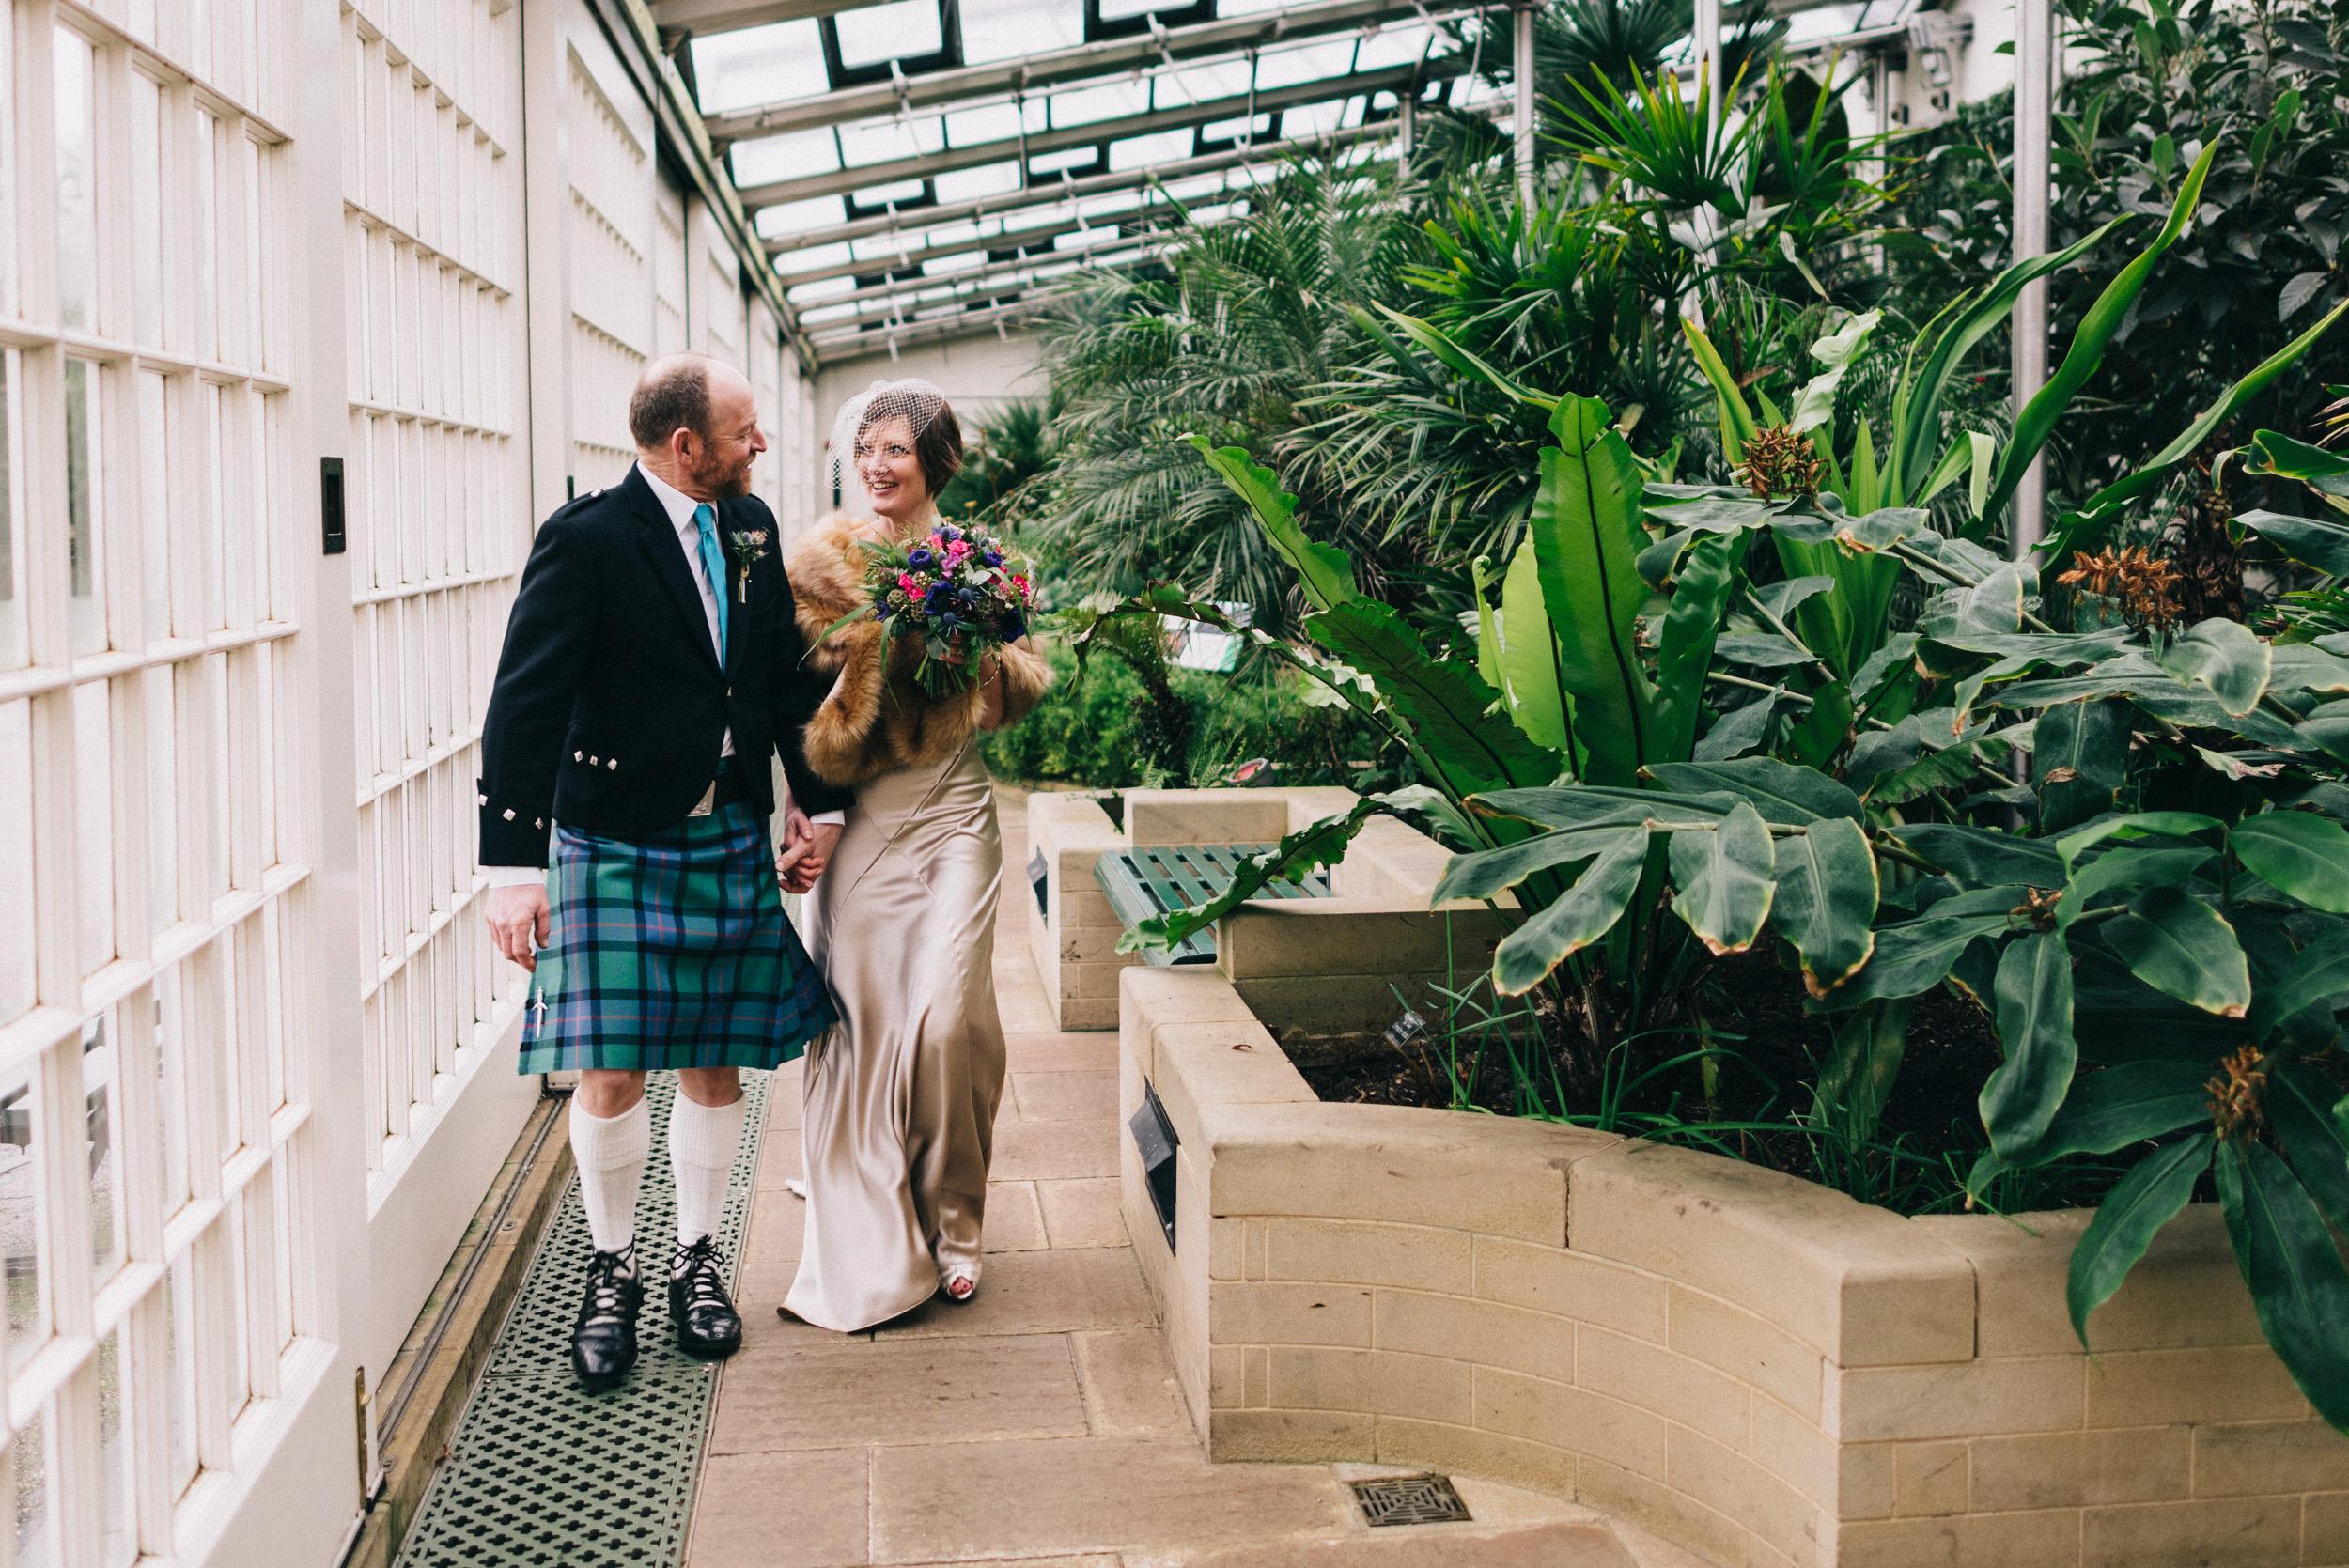 Alice-Bias-Cut-Silk-Wedding-Dress-Kate-Beaumont-Sheffield-Botanical-Gardens-by-Peakography-17.jpg